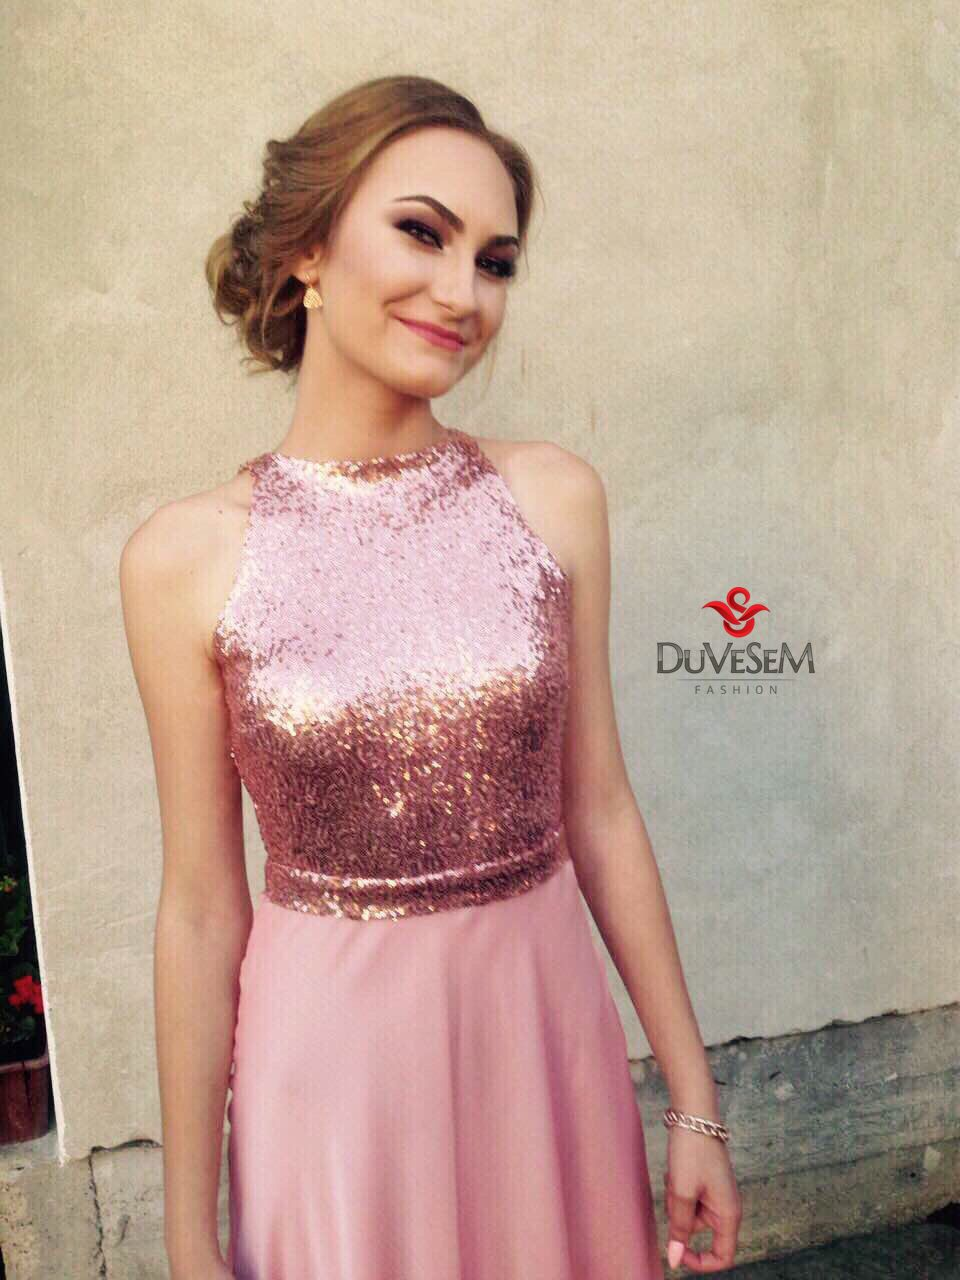 Pin On Duvesem Fashion